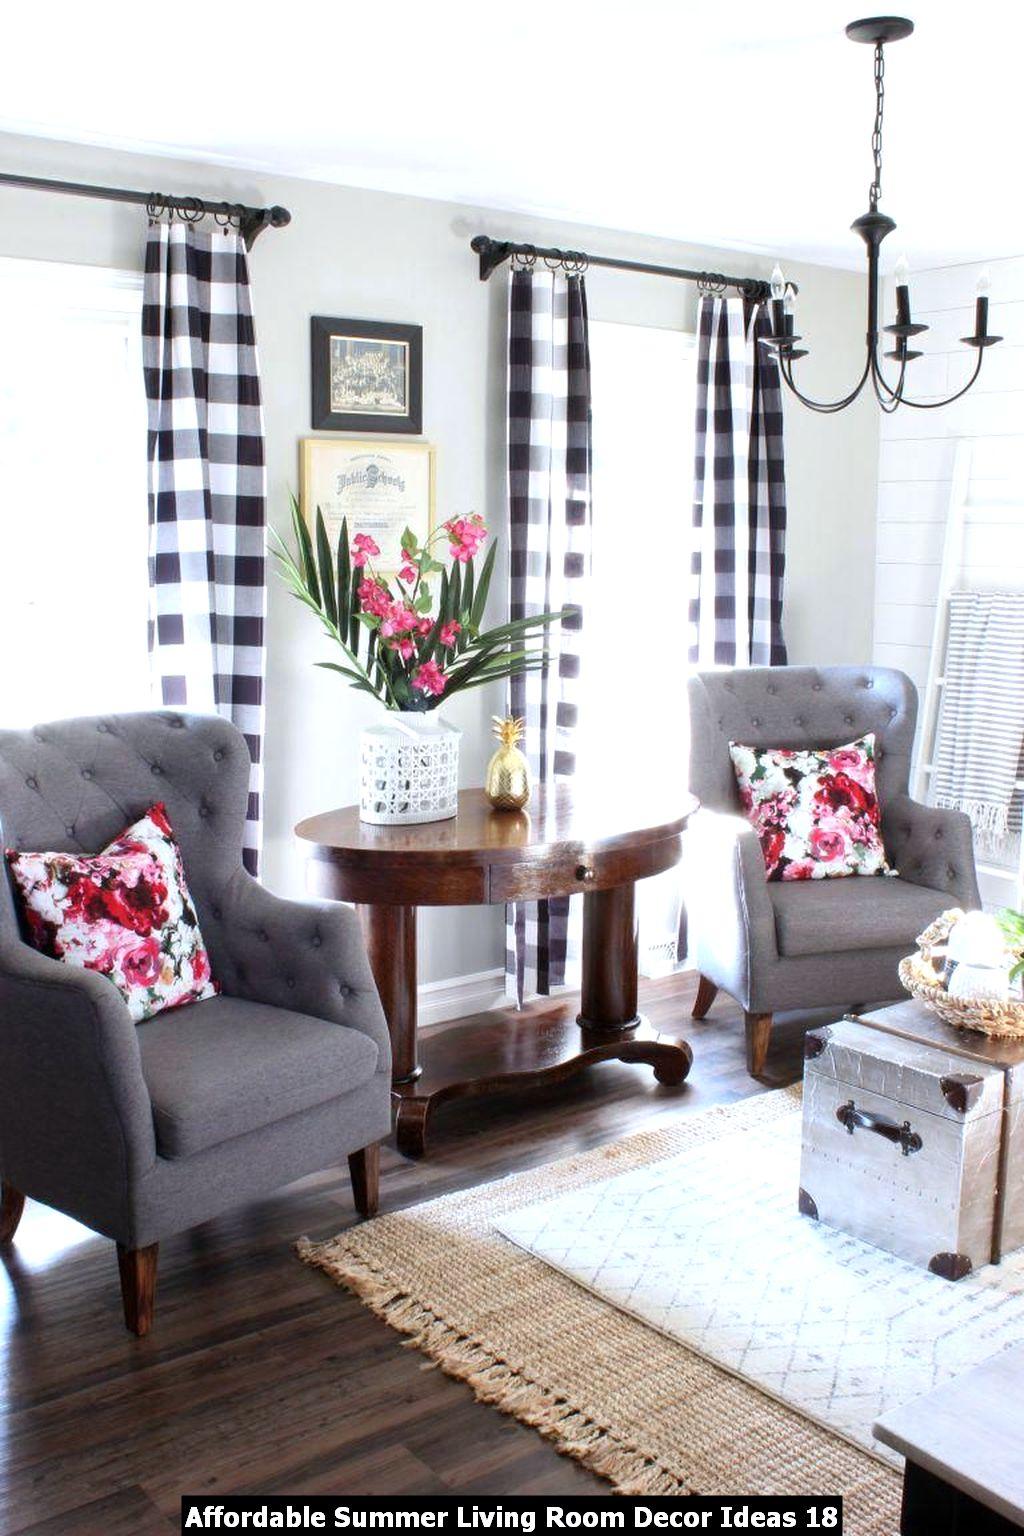 Affordable Summer Living Room Decor Ideas 18